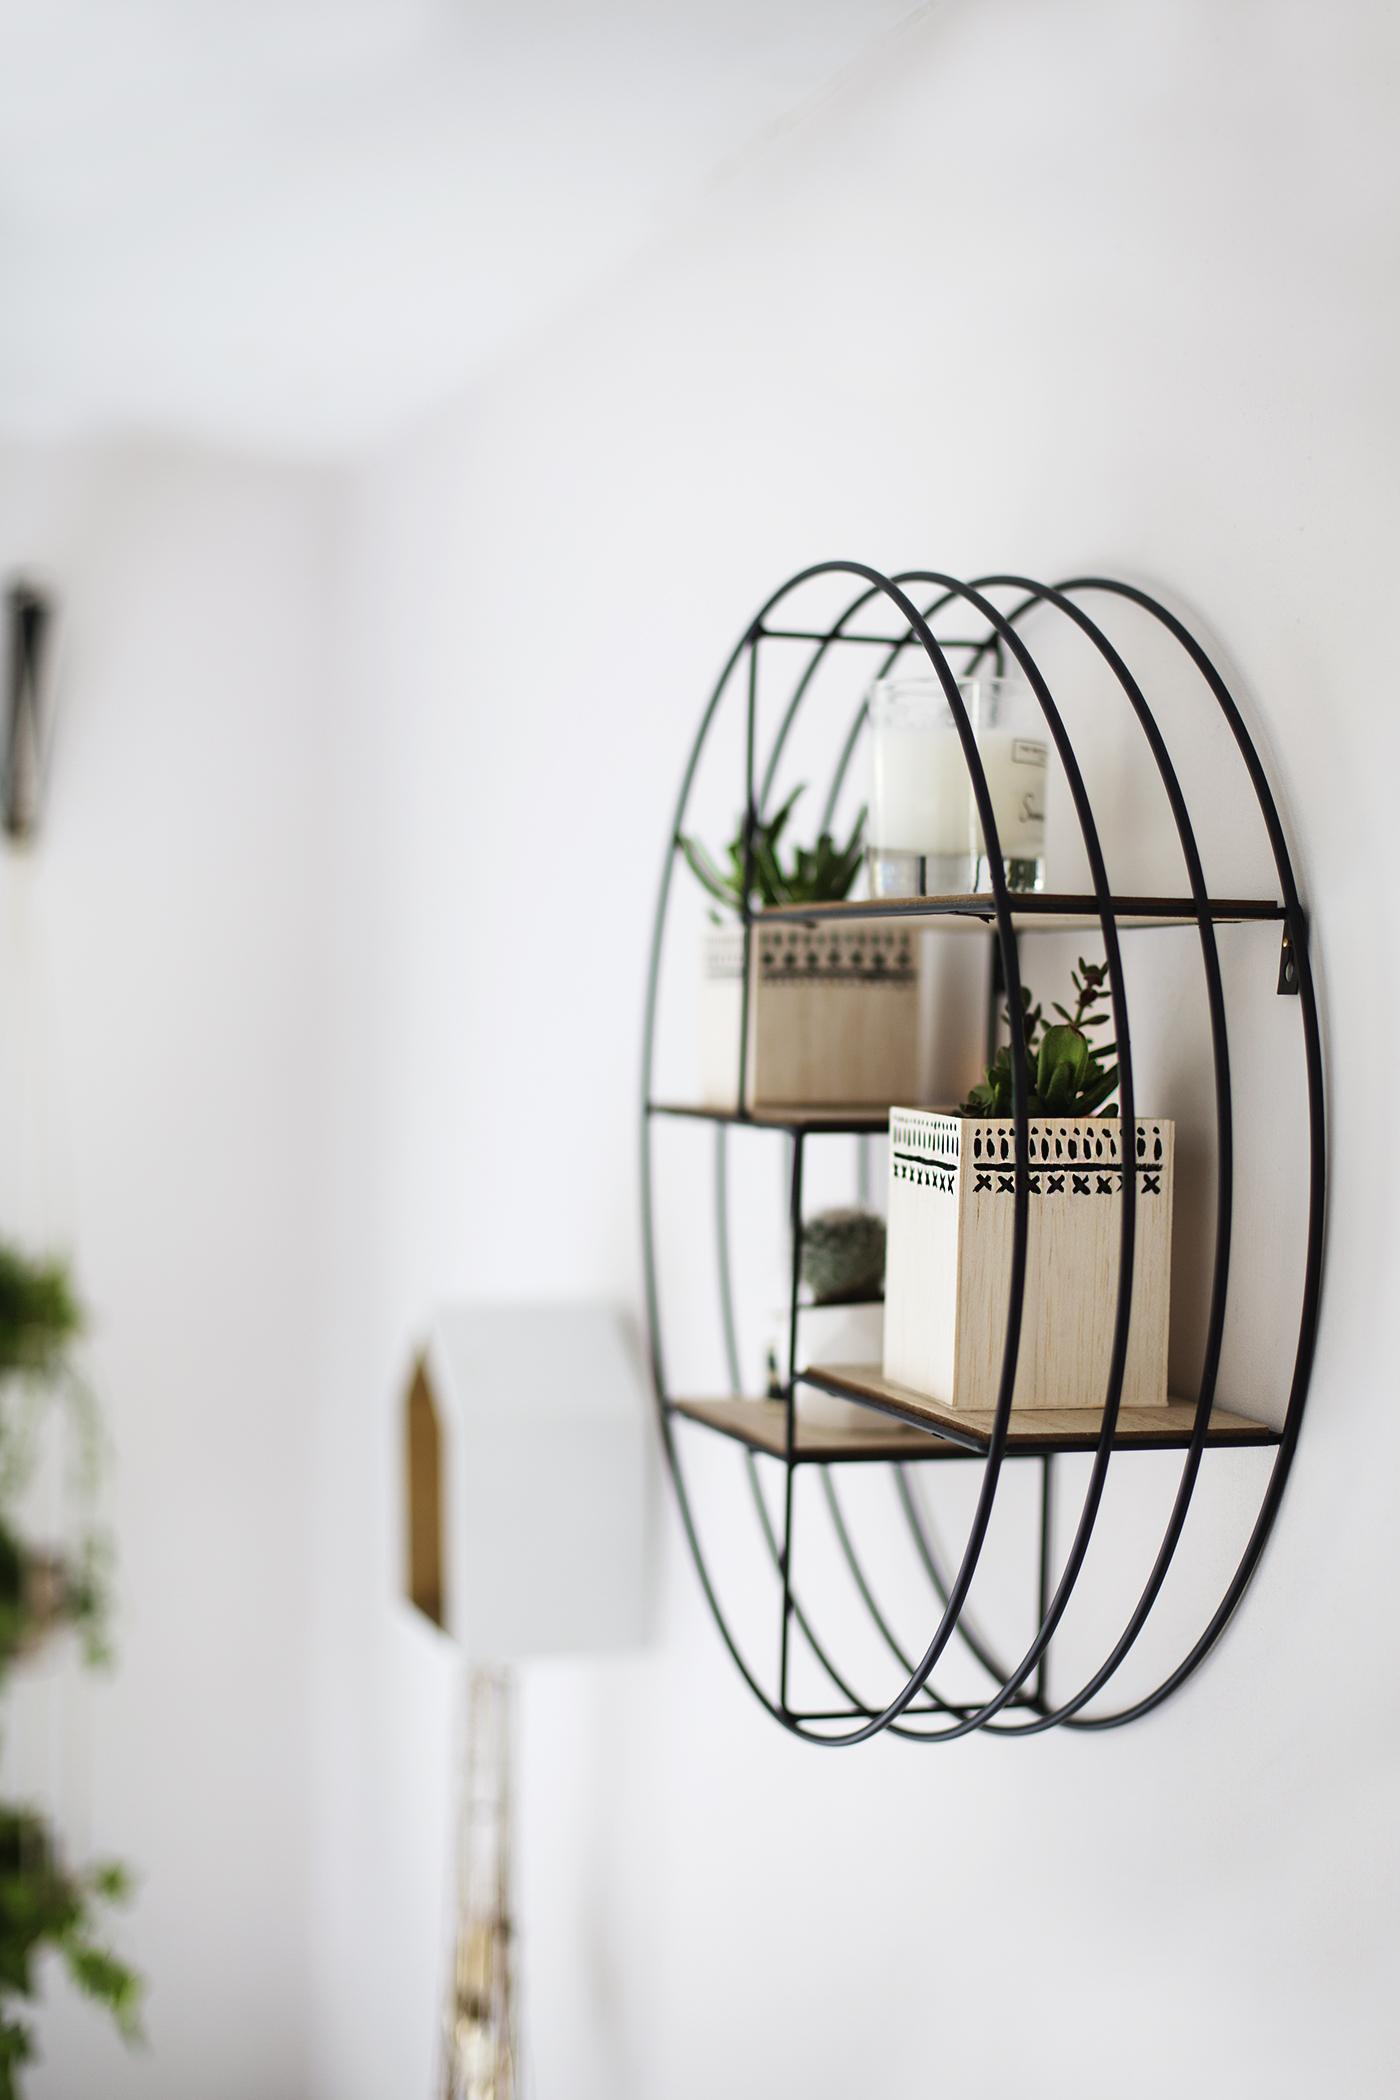 DIY-decorative-wood-planters-easy-home-craft-ideas-home-decor